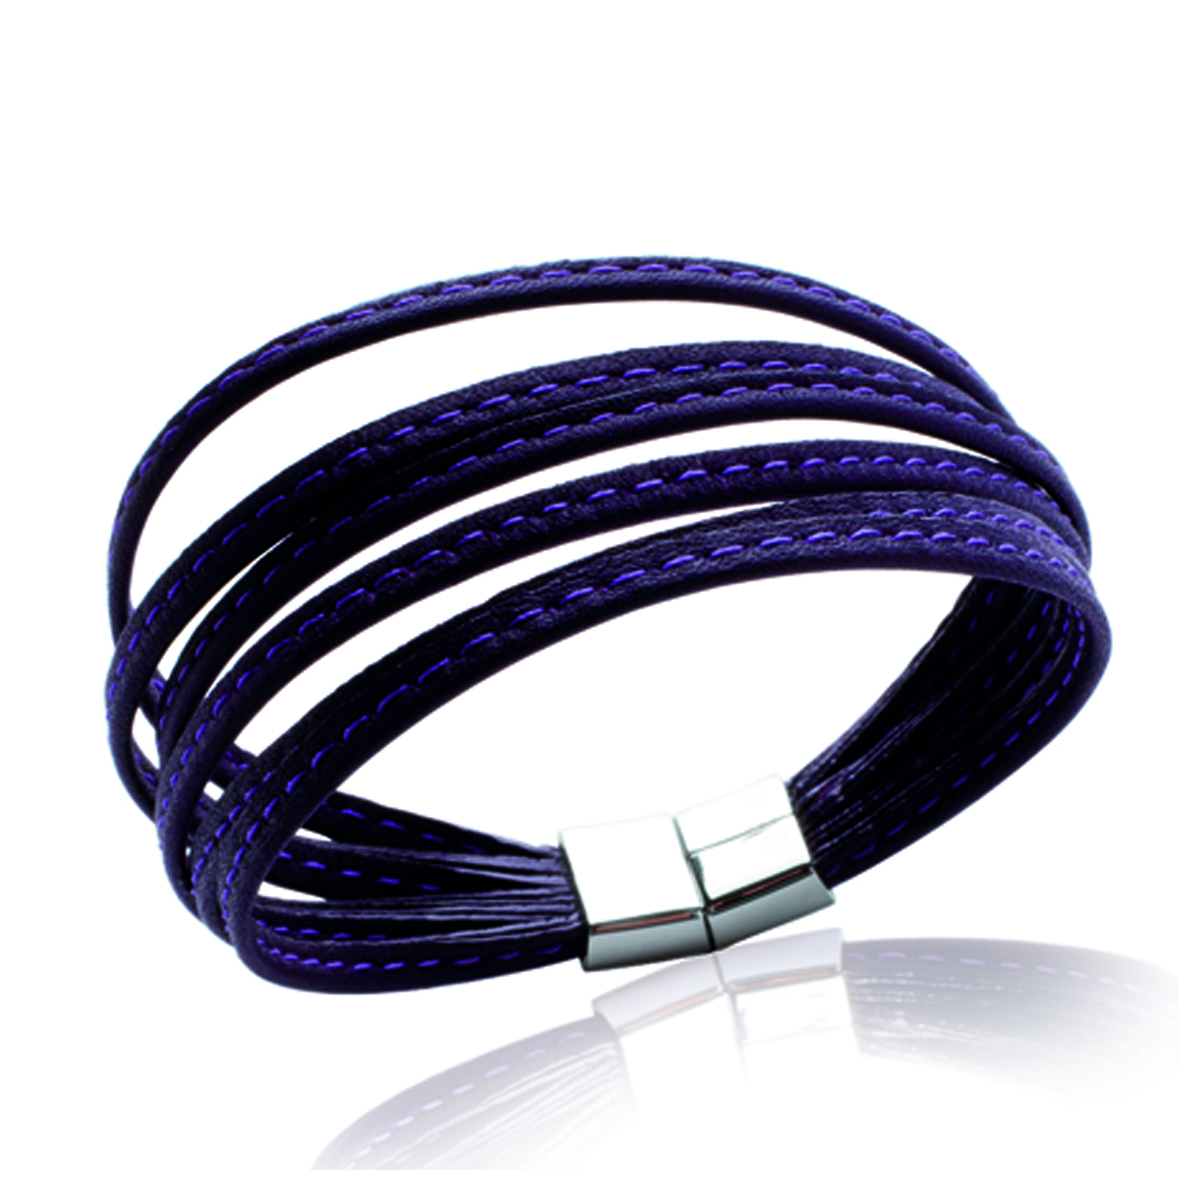 Bracelet acier mixte \'Peaceful\' violet / acier  - 6 rangs 3 mm - [I8063]